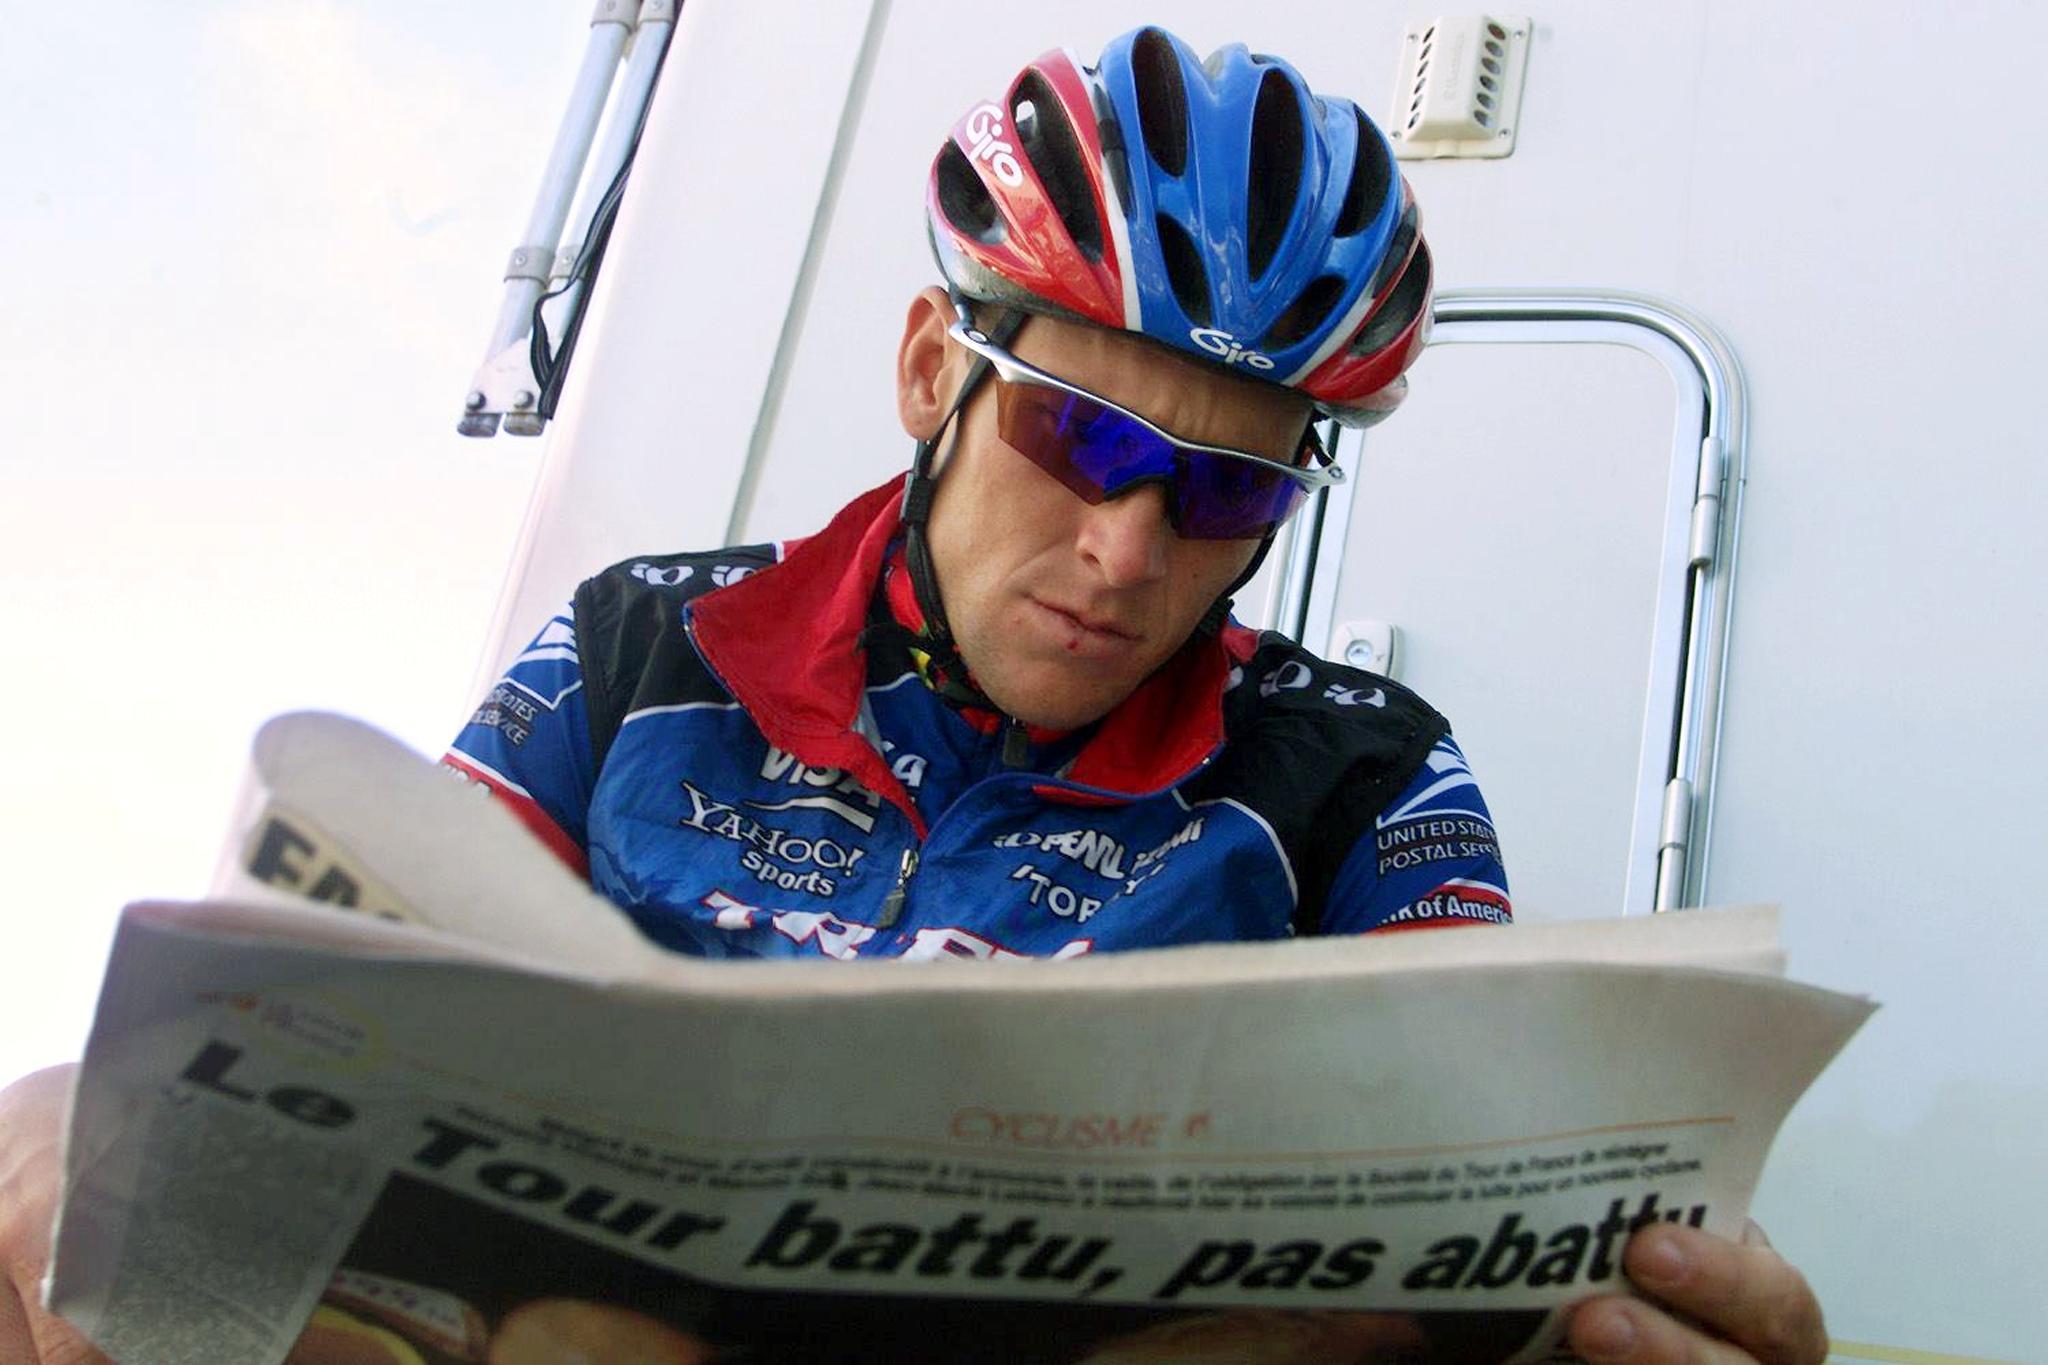 Lance Armstrong va marturisi ca s-a dopat, dar nu va da detalii